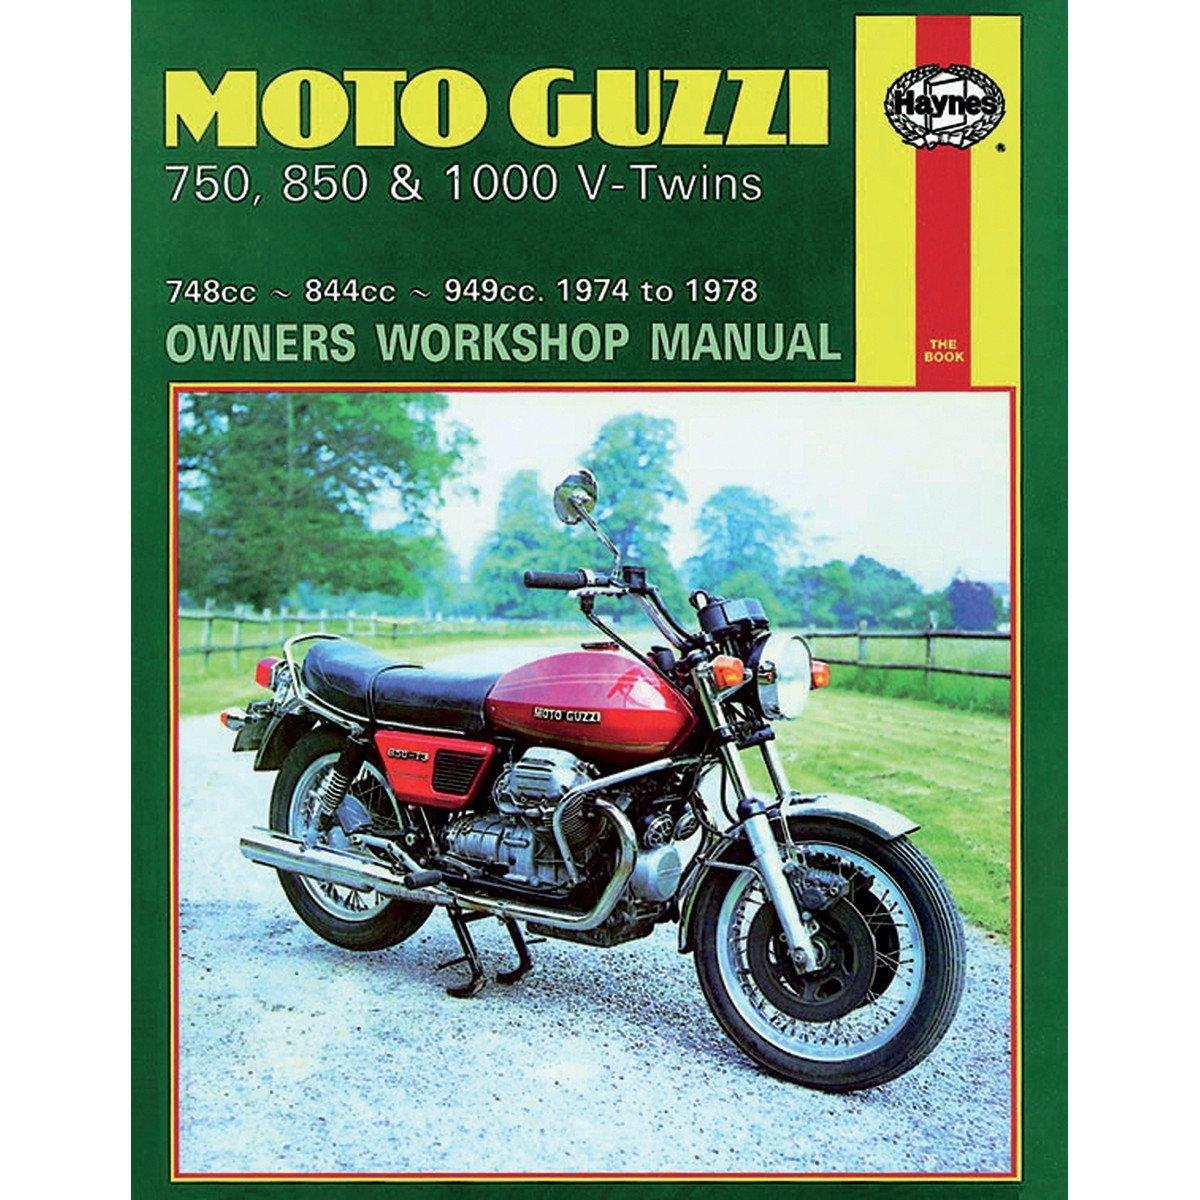 Haynes Repair/Service Manual 339 Fits 77-78 Moto Guzzi 850 T/3 FB